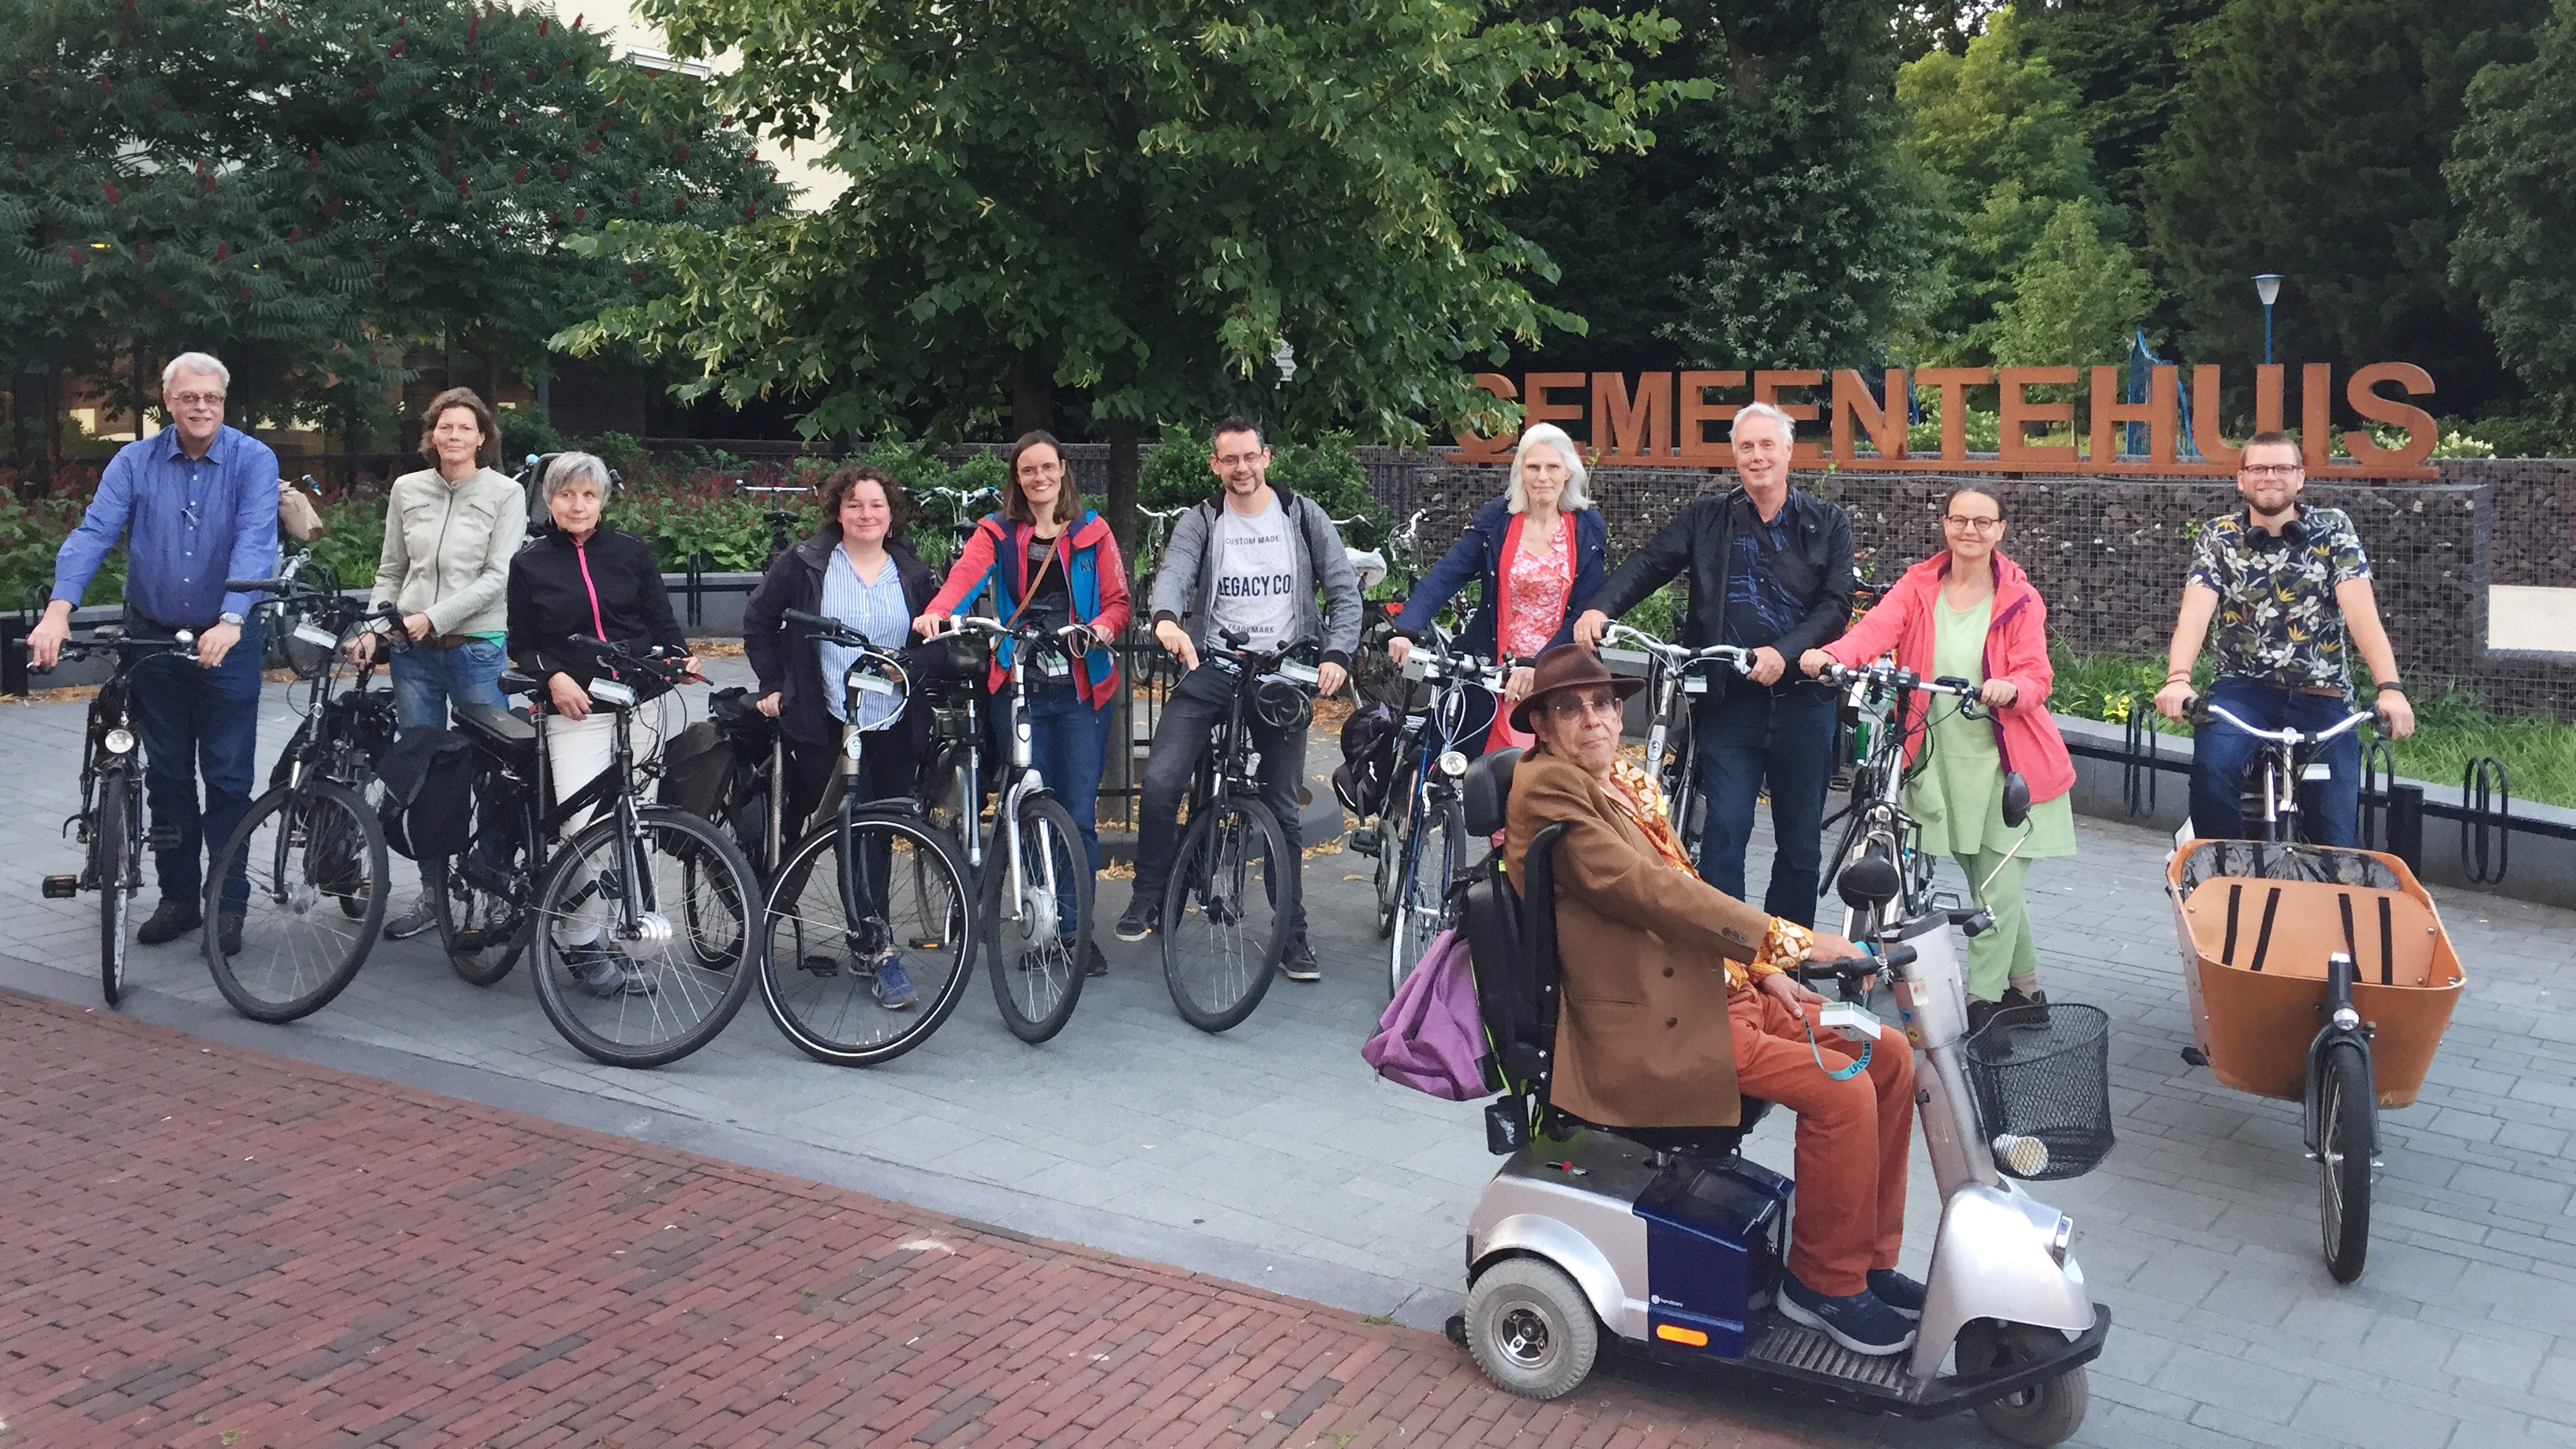 Province of Utrecht gains insight into air quality through mobile sensors